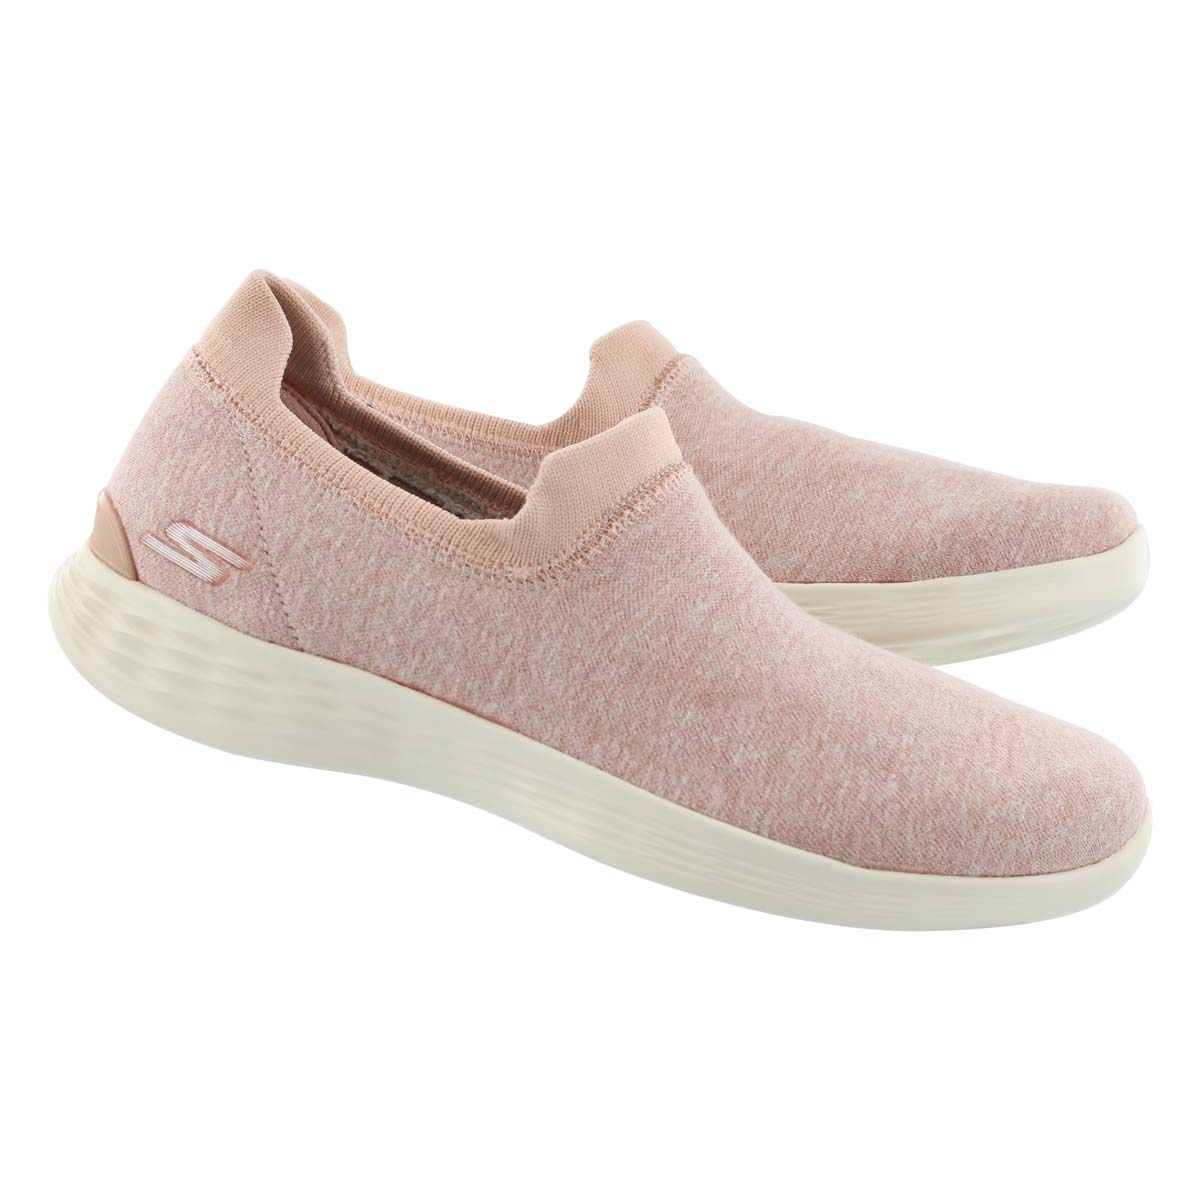 Chaussure You Define, rose pâle, fem